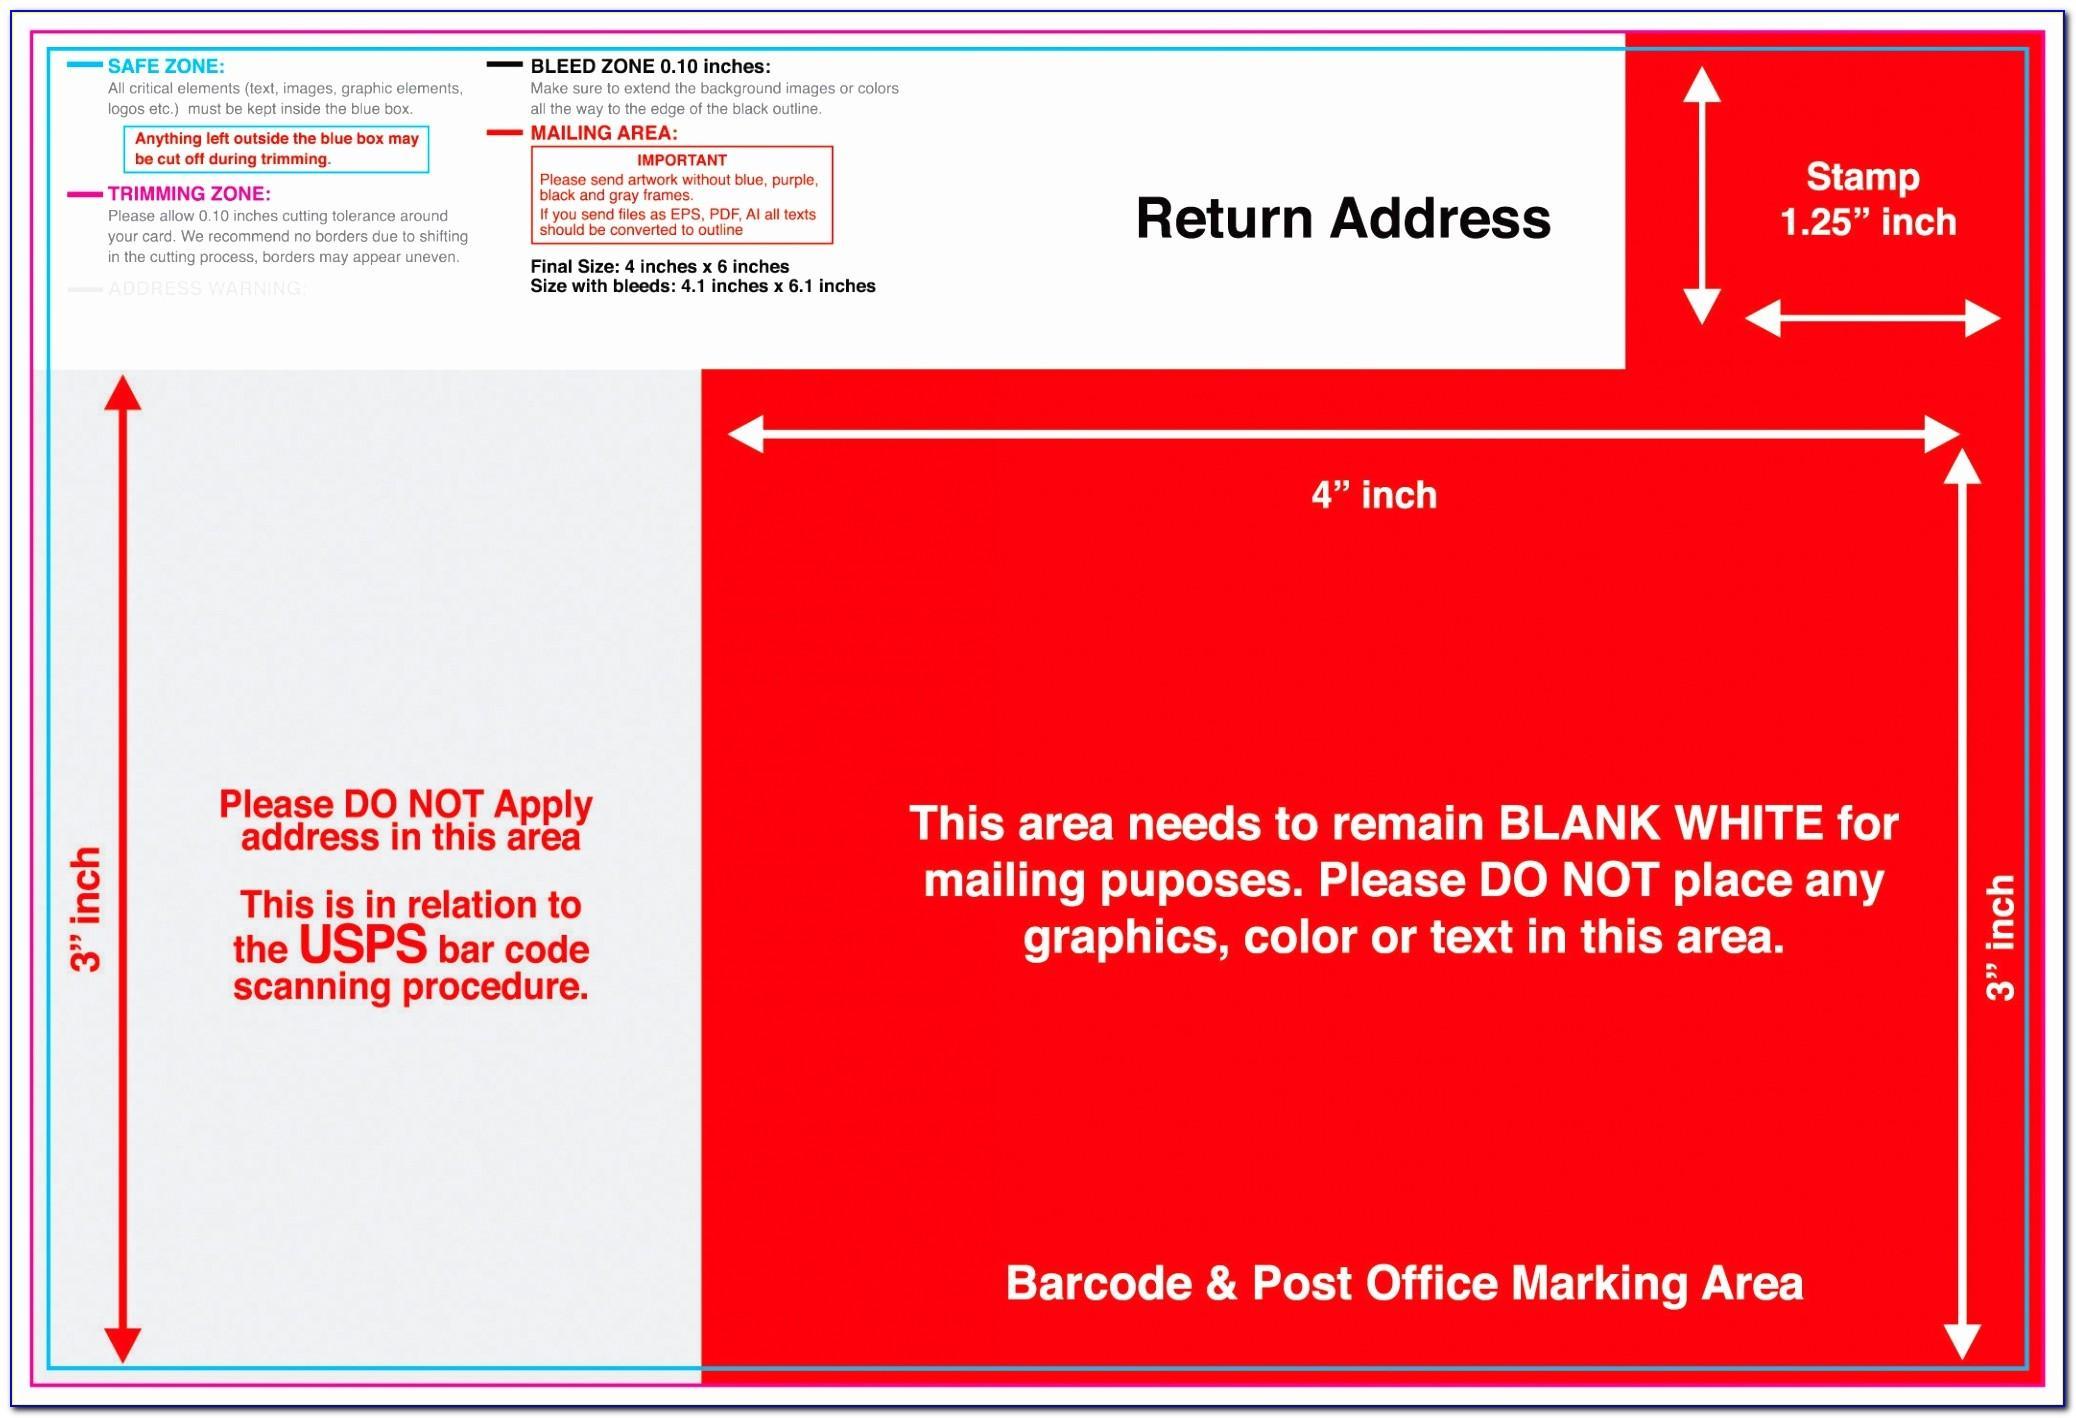 Usps Postcard Template 8.5 X 5.5